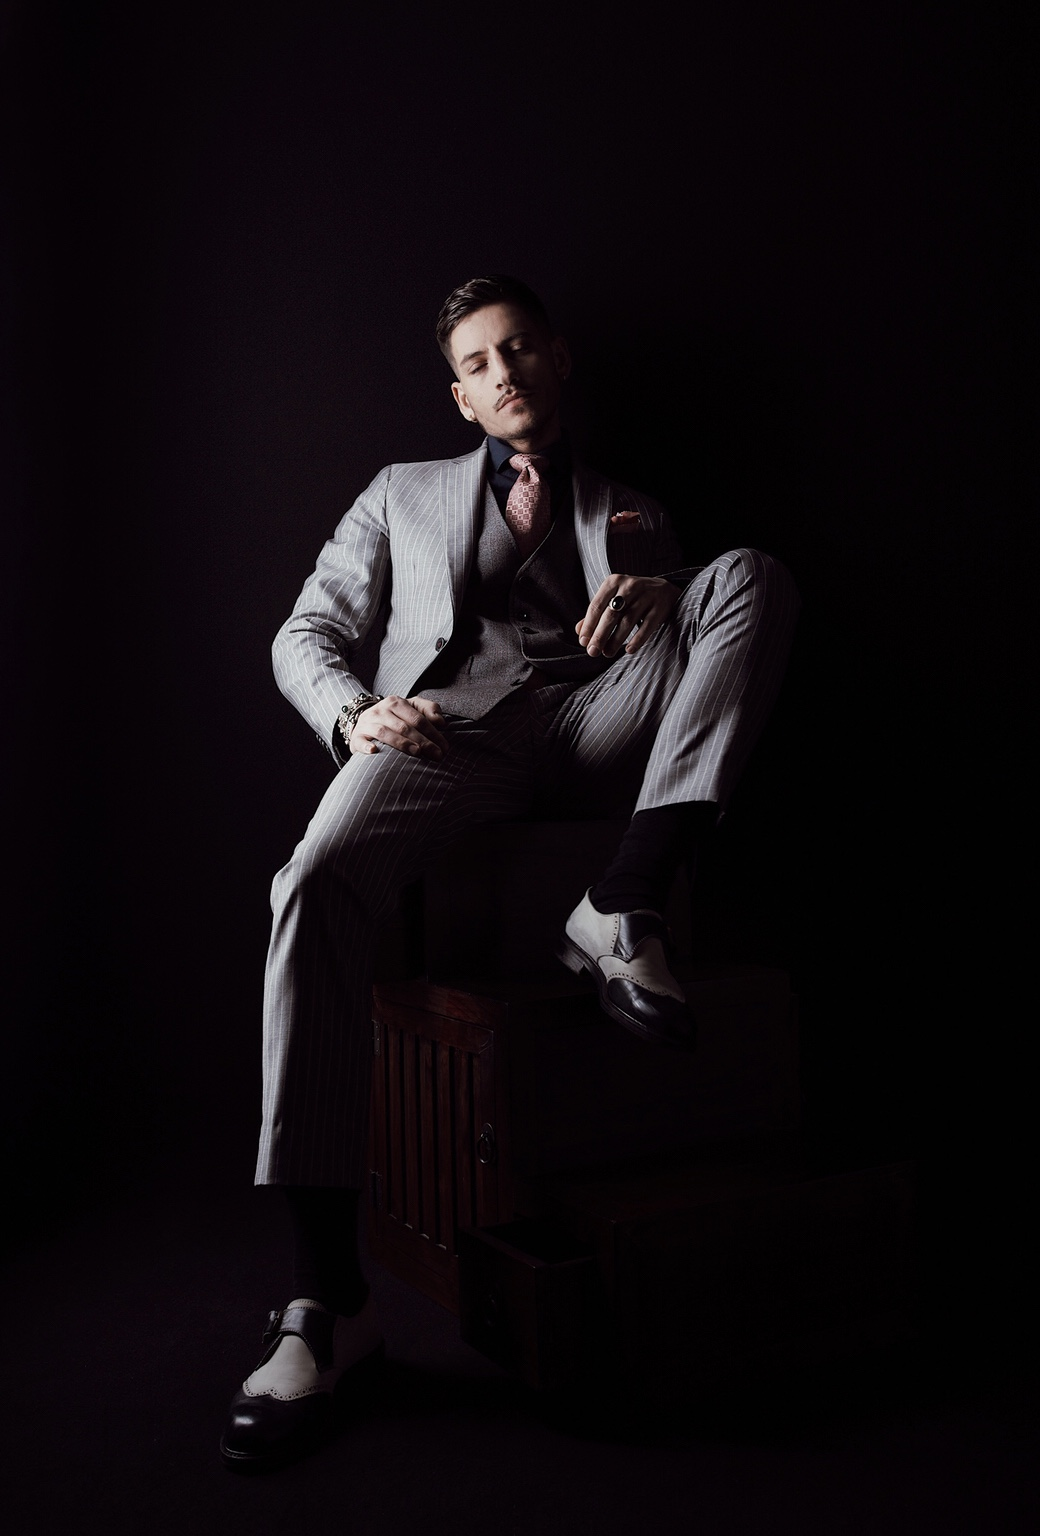 Ivan Toropey - Gentleman's Guide 13.2 - 01.jpg